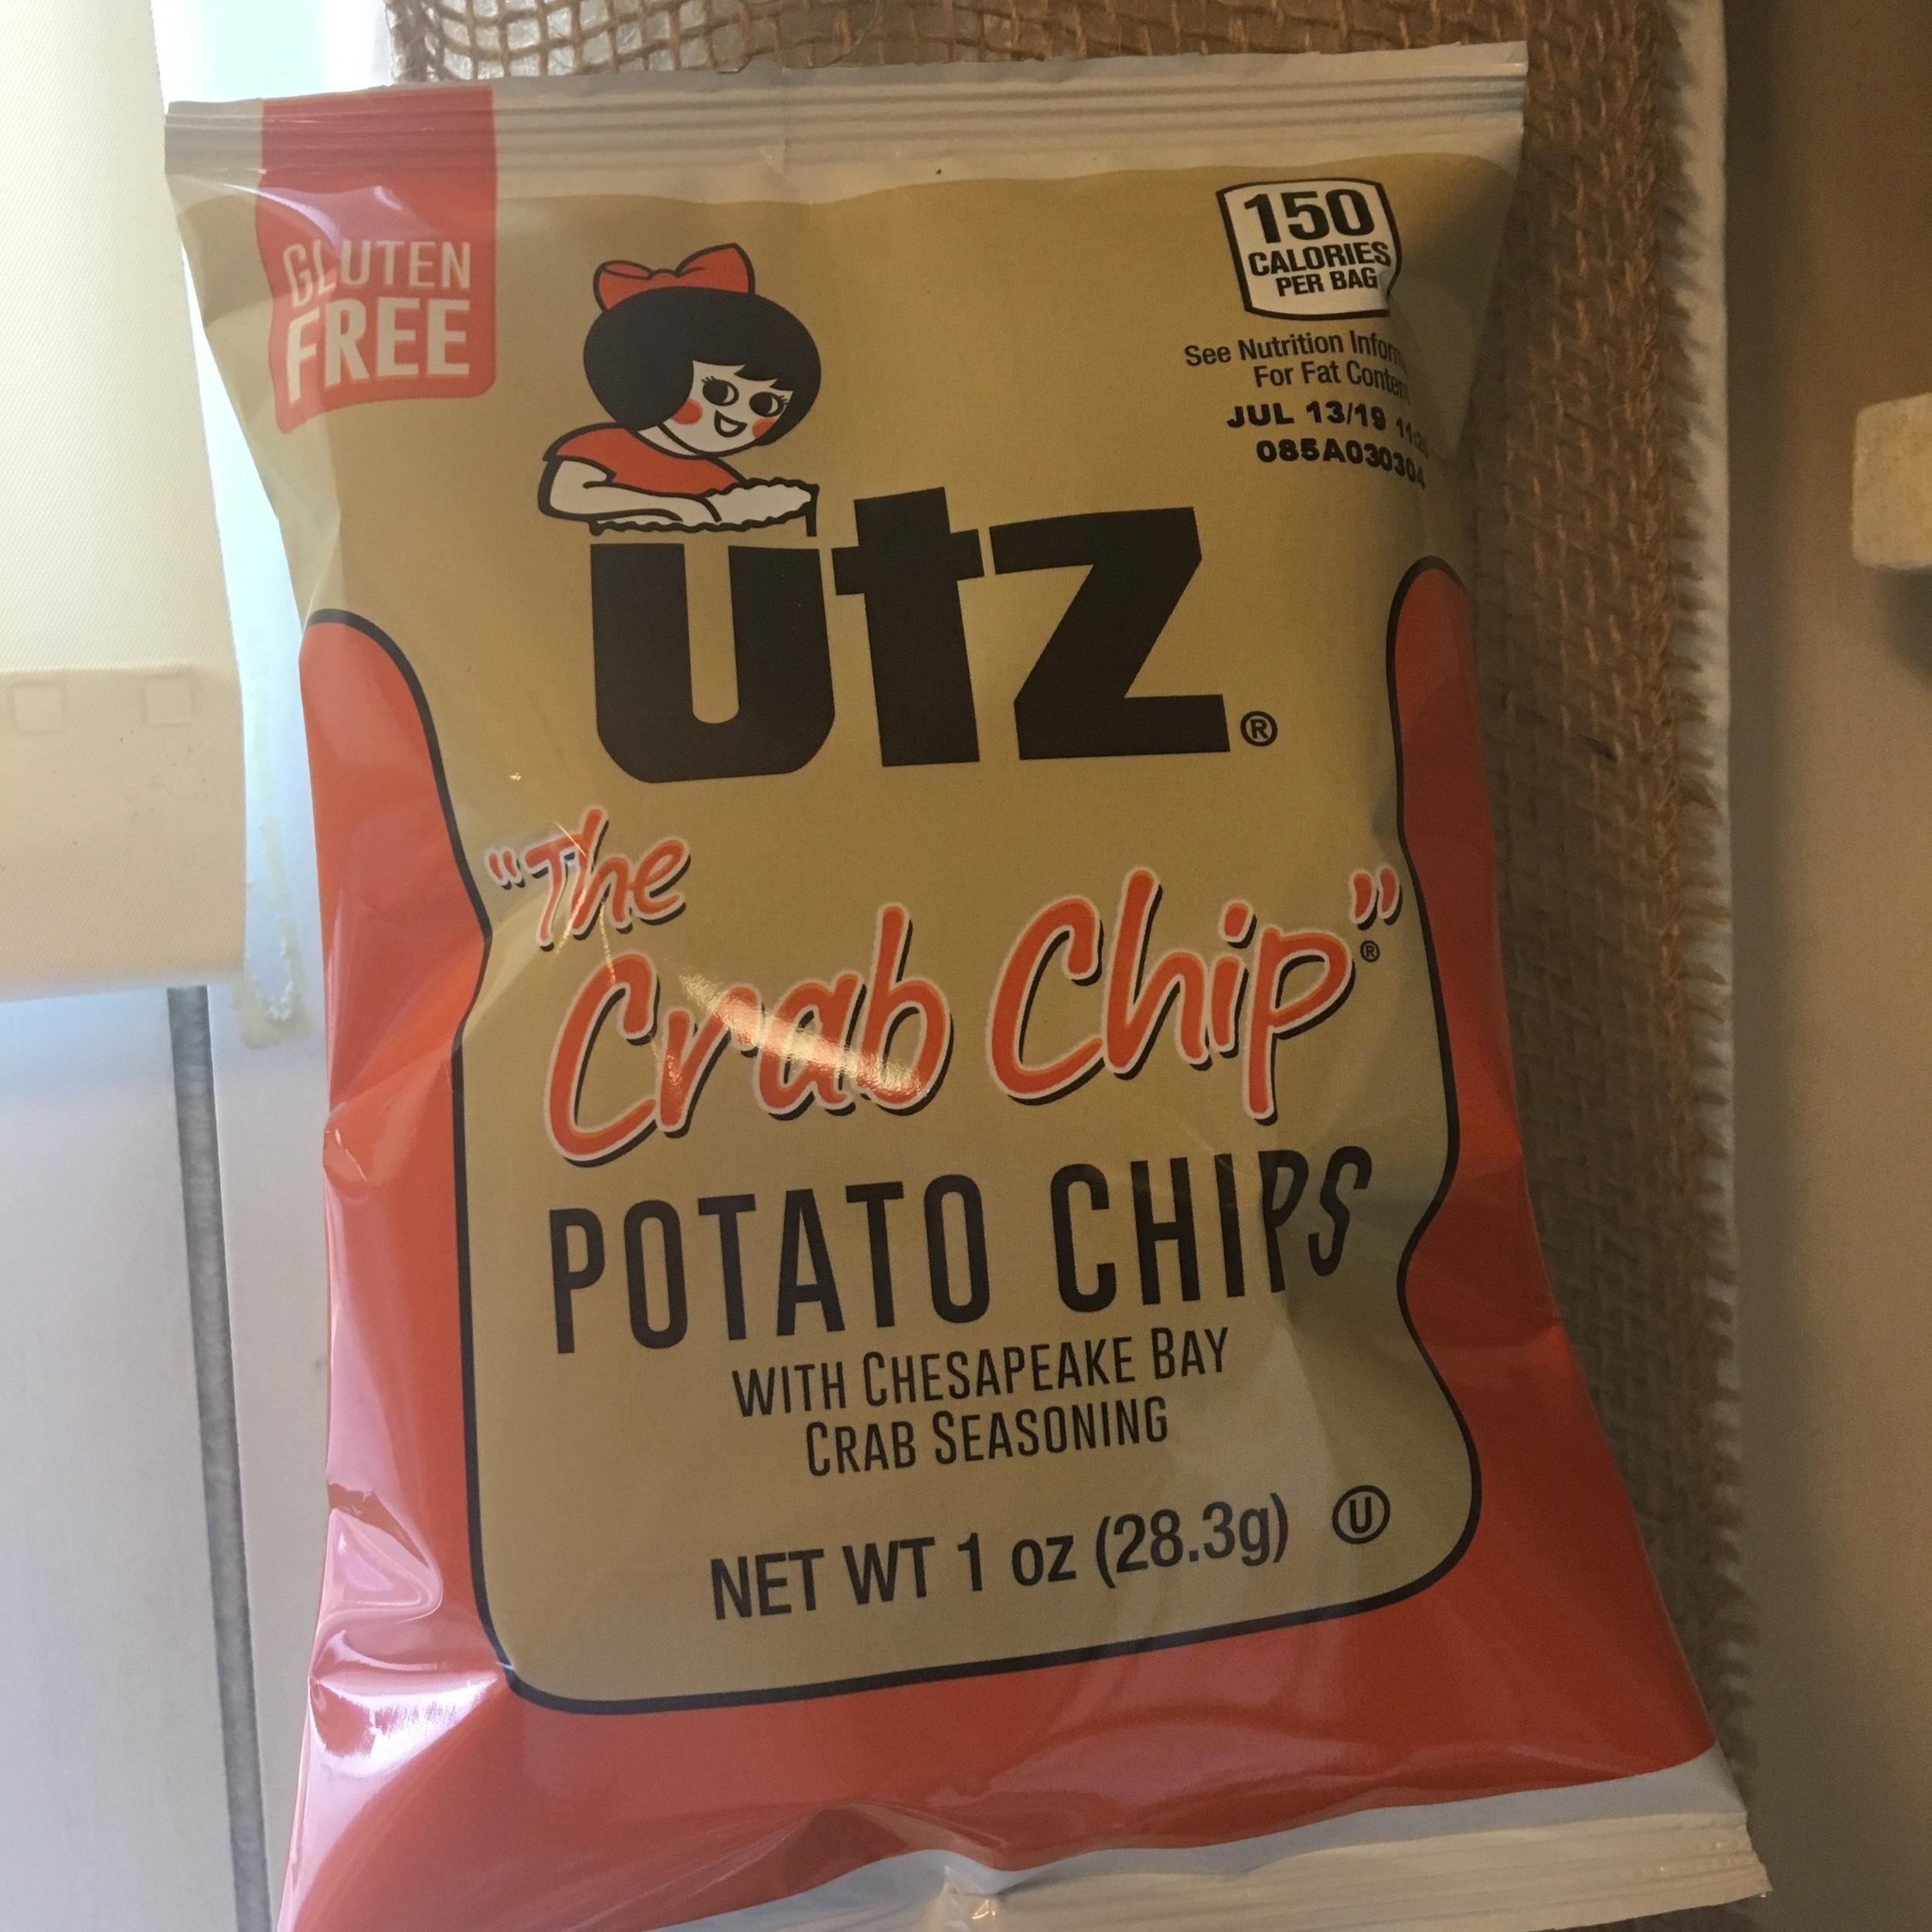 Utz Crab Chips